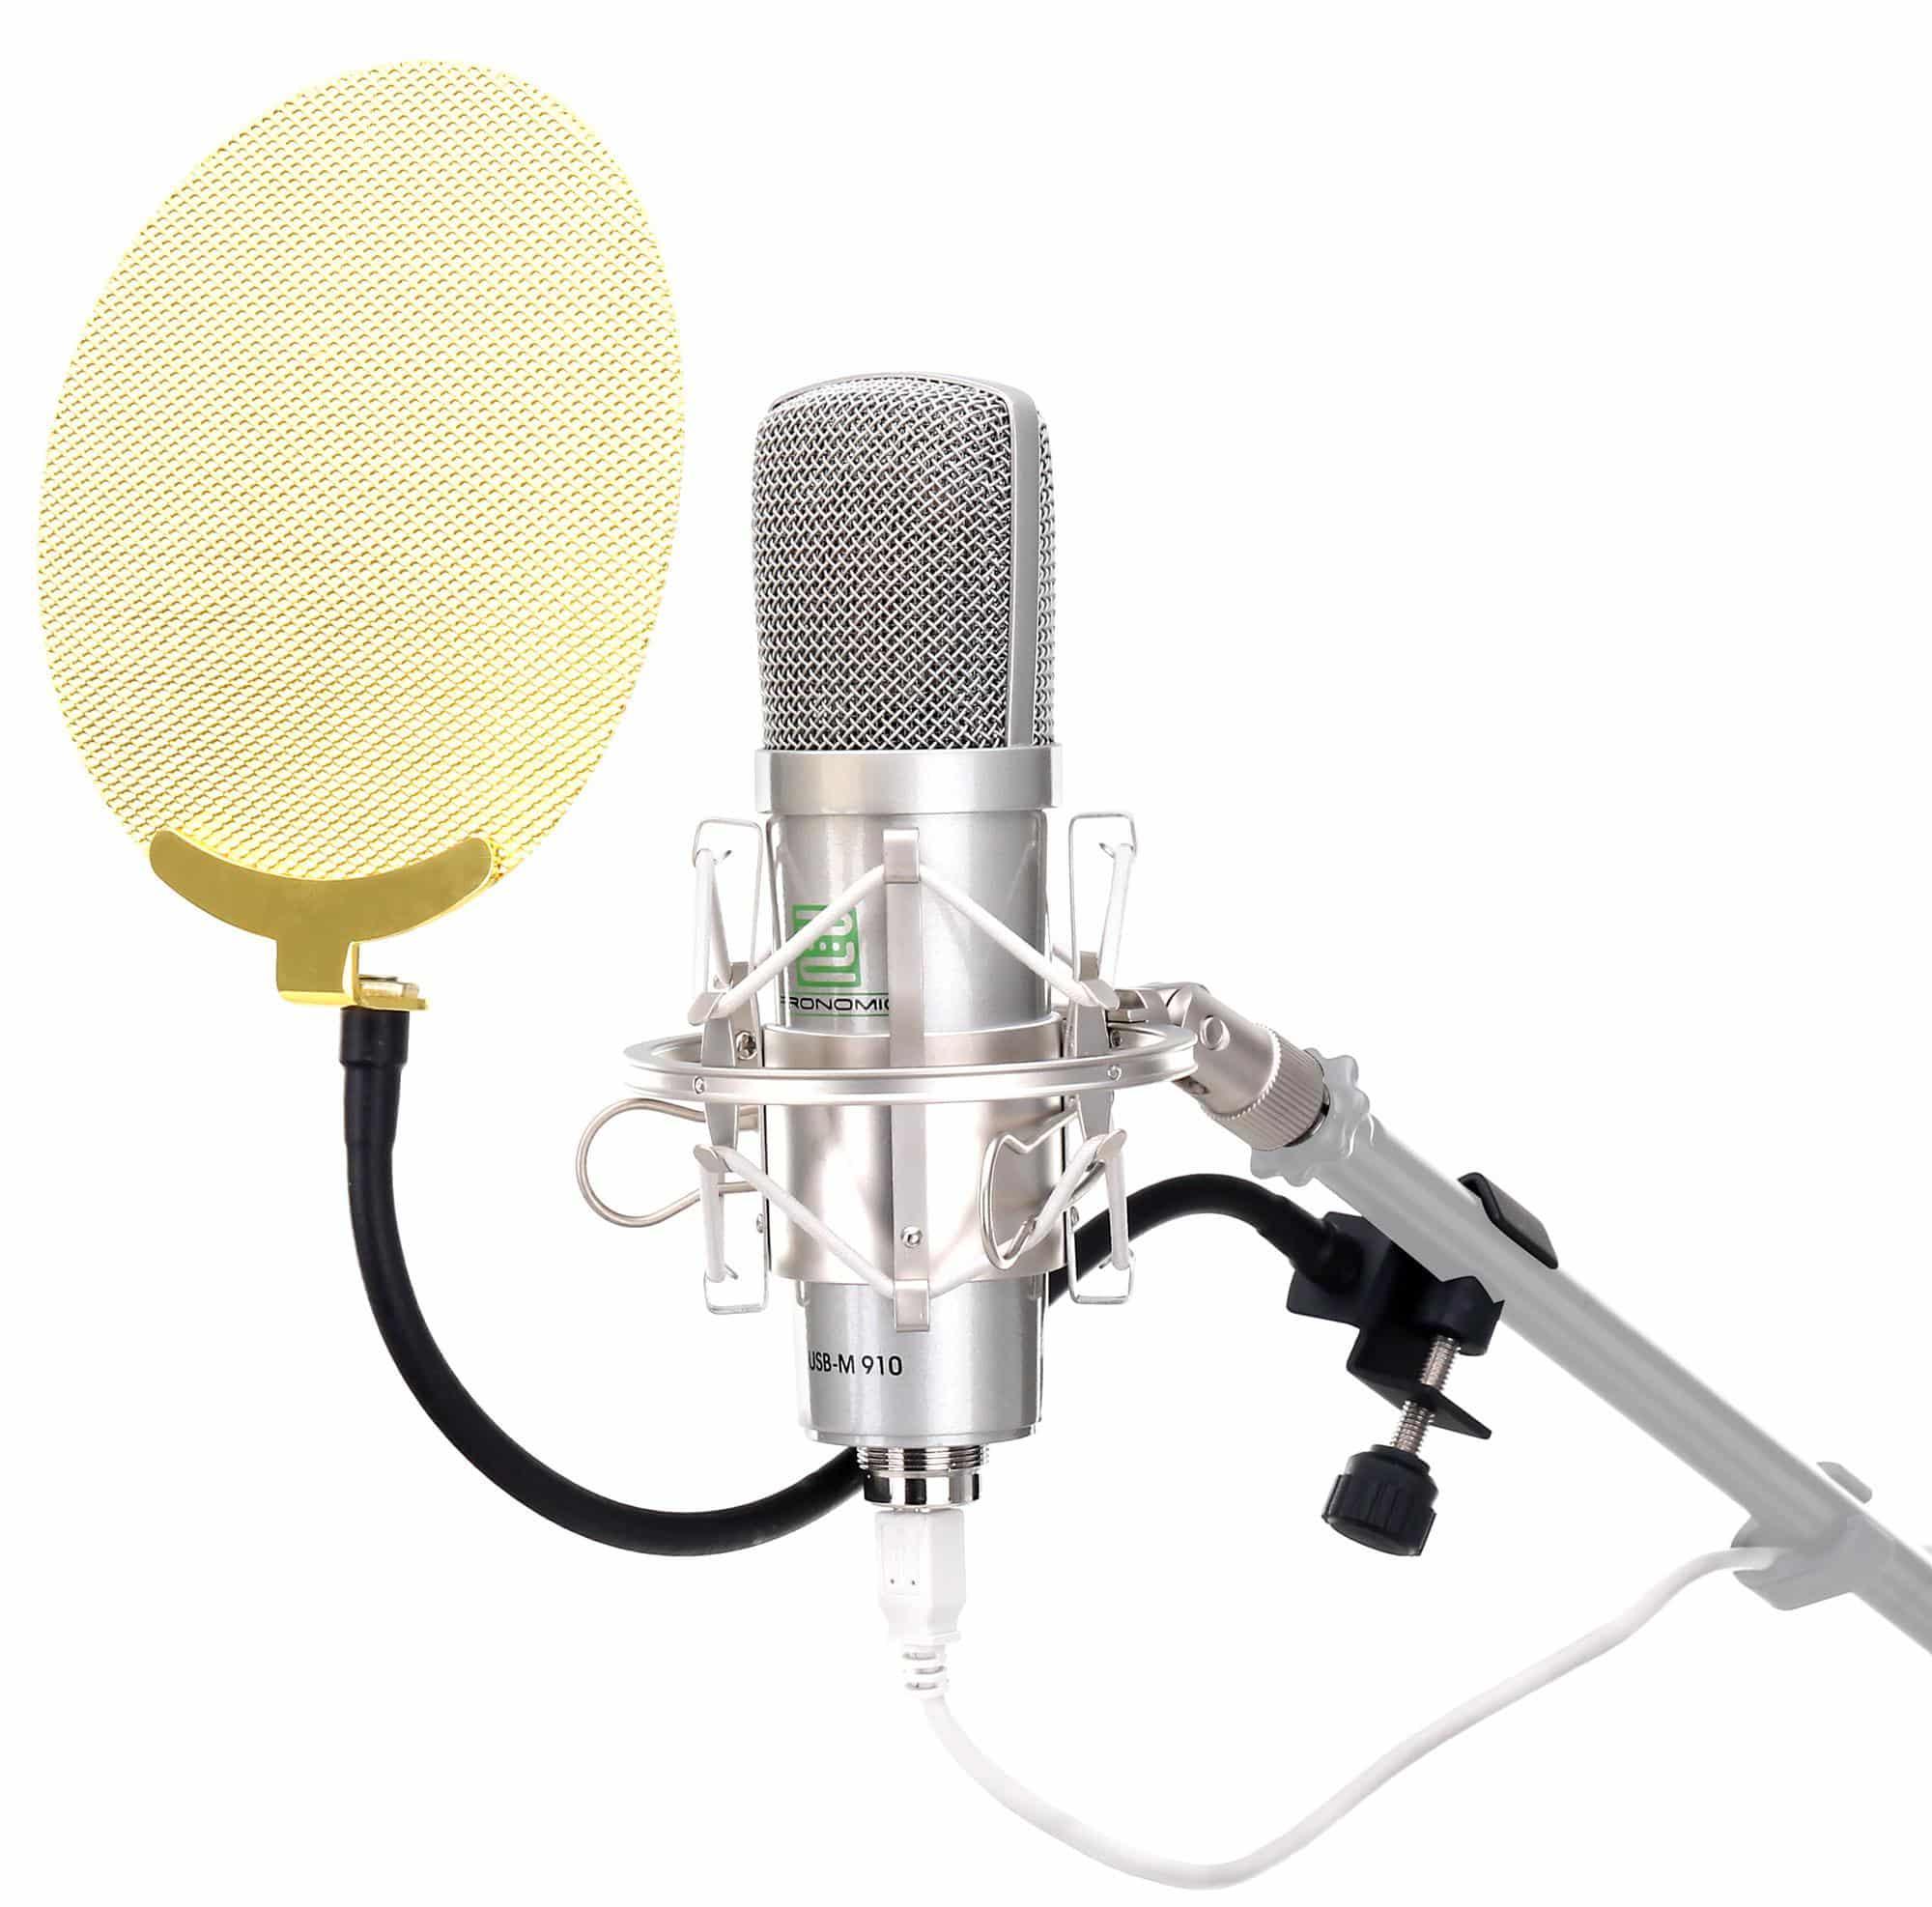 Mikrofone - Pronomic USB M 910 Podcast Kondensatormikrofon Set inkl. Popschutz gold - Onlineshop Musikhaus Kirstein